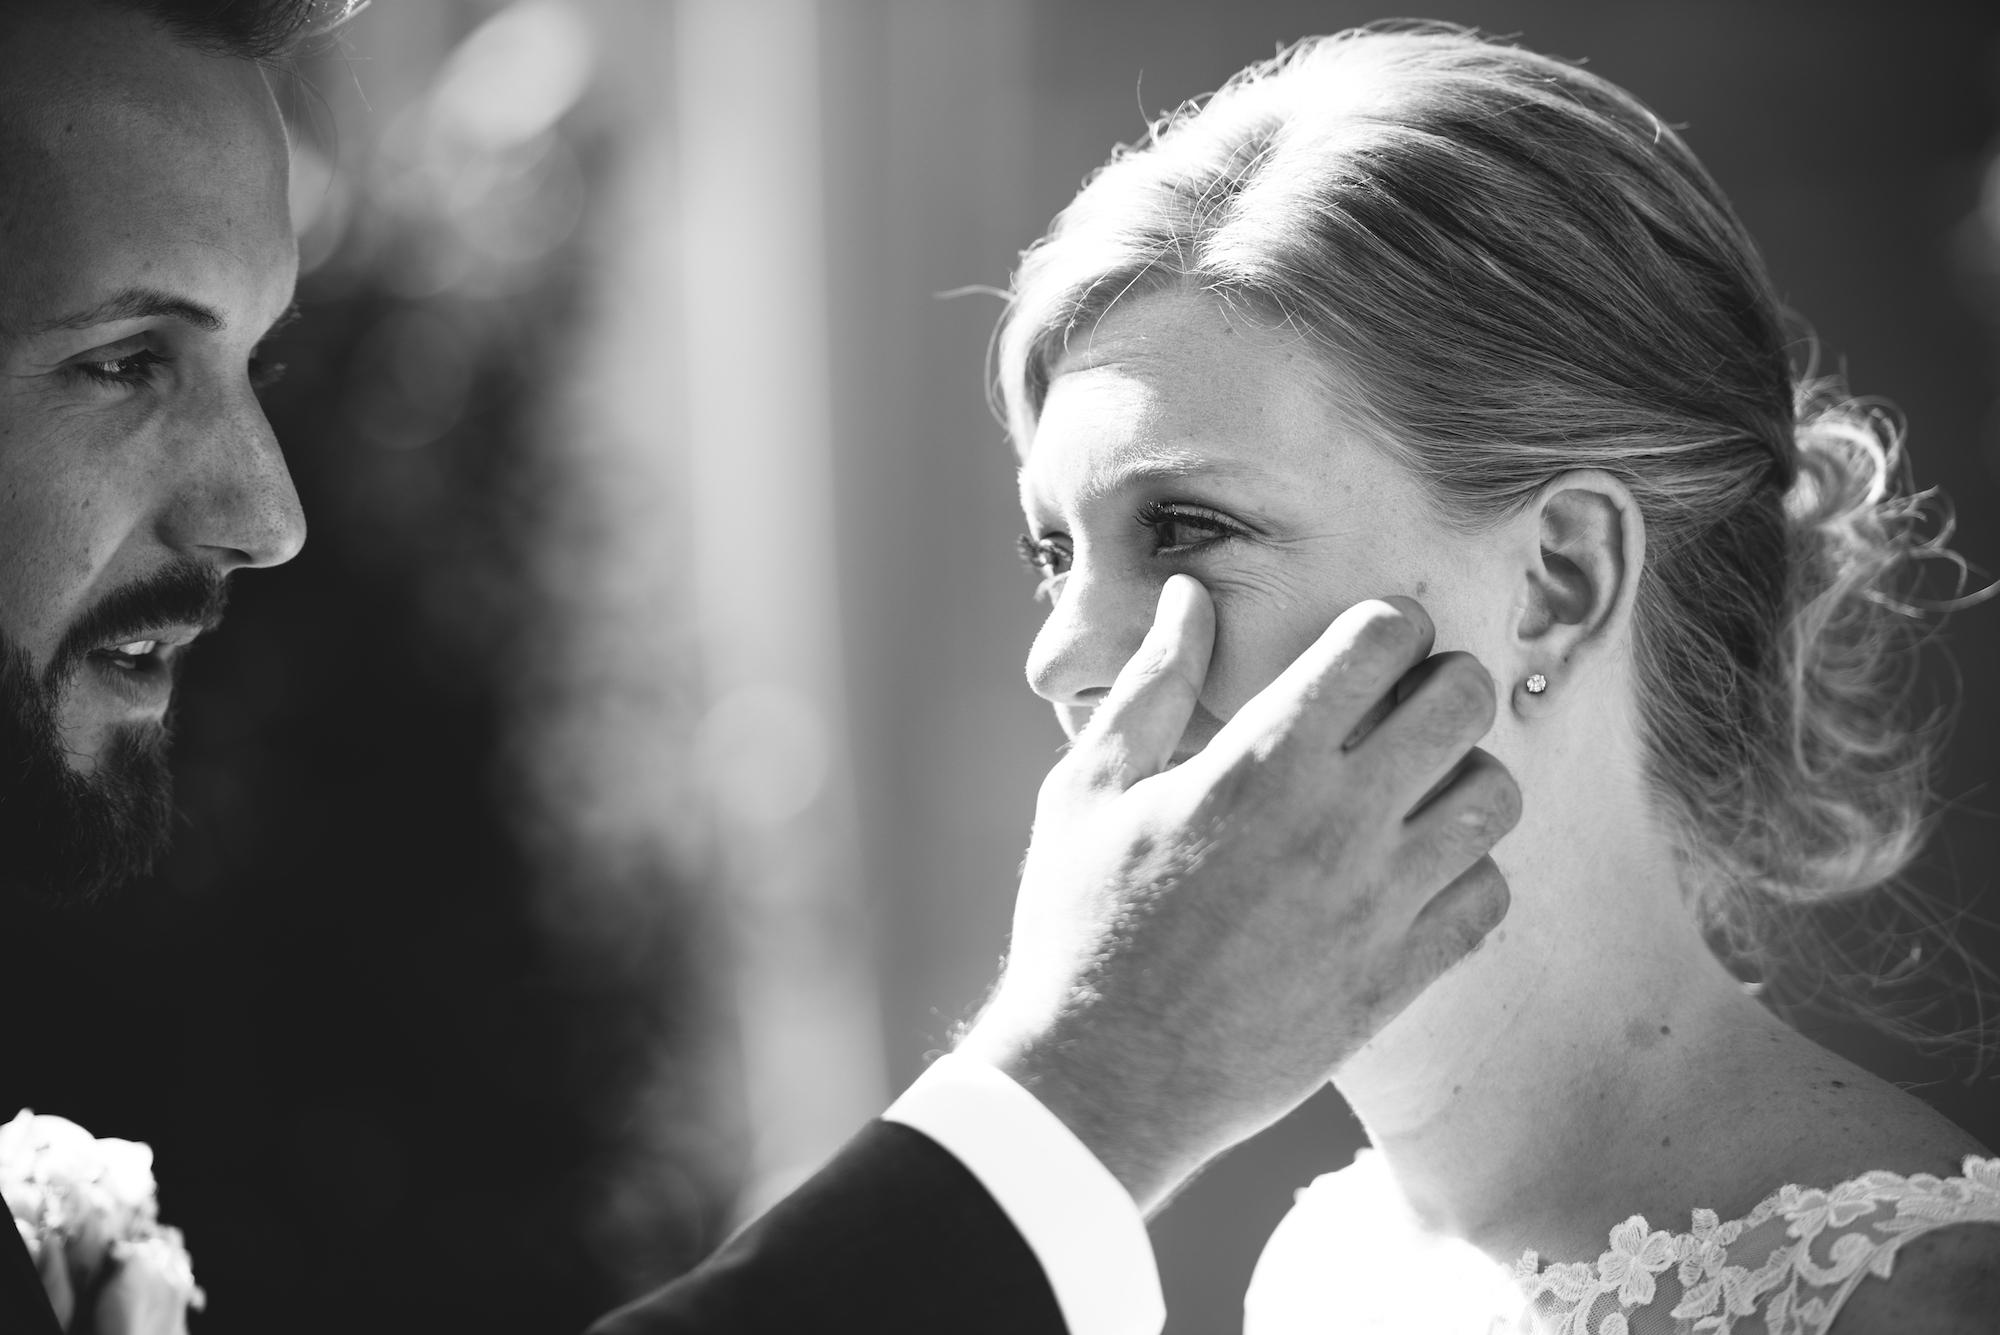 NadiaundMichael_Hochzeit_BekaBitterliFotografie_255.jpg